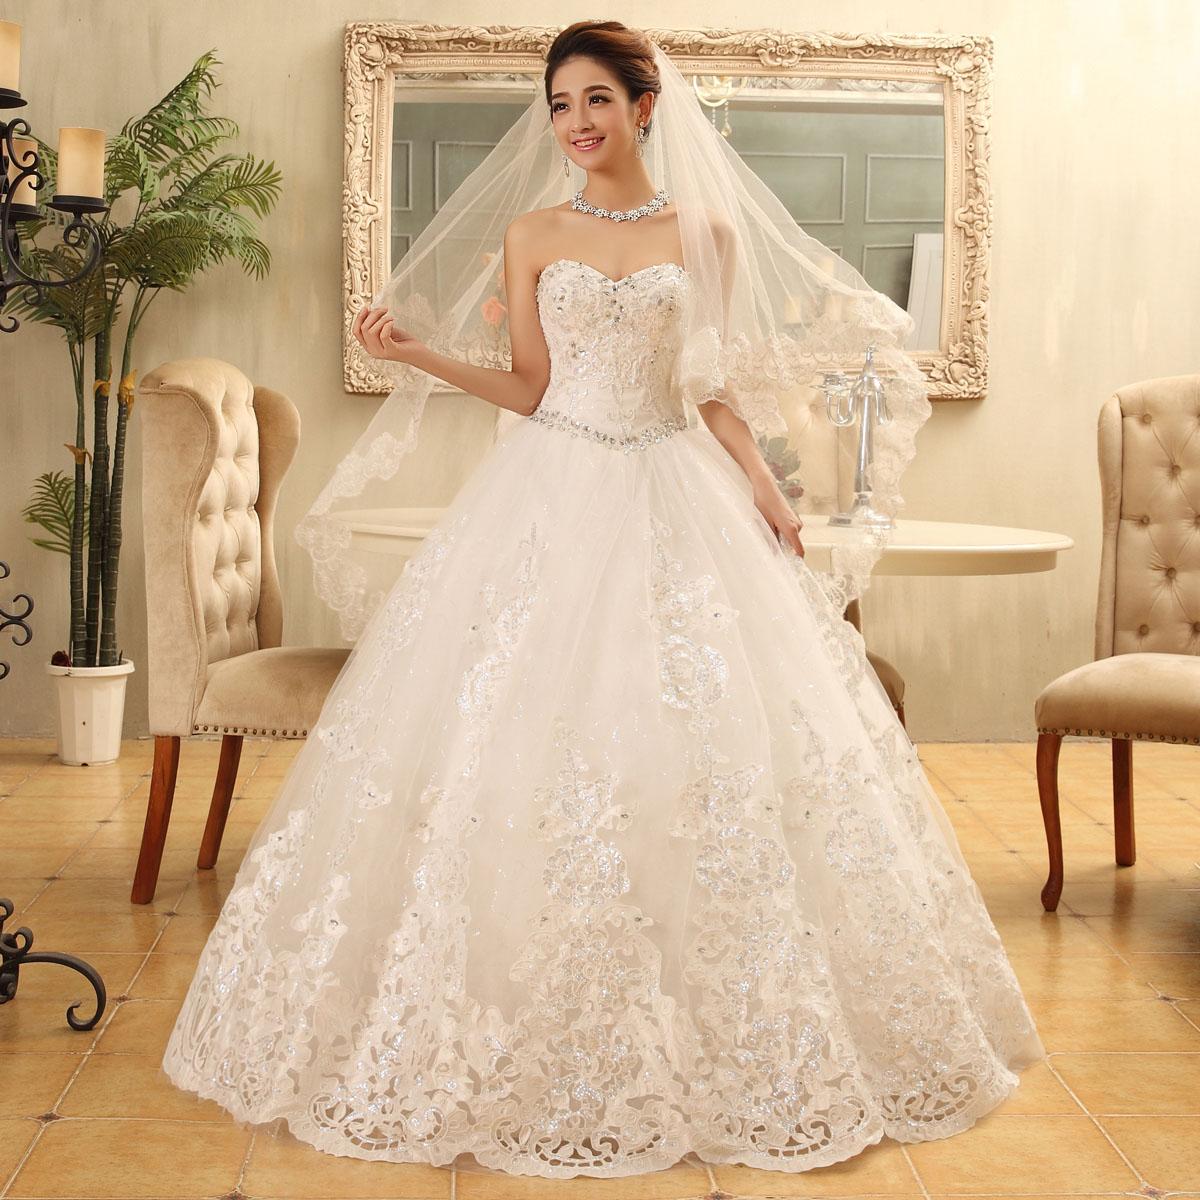 2015 bride white vintage tube top princess wedding dress a line wedding dresses robe de mariage princesse(China (Mainland))